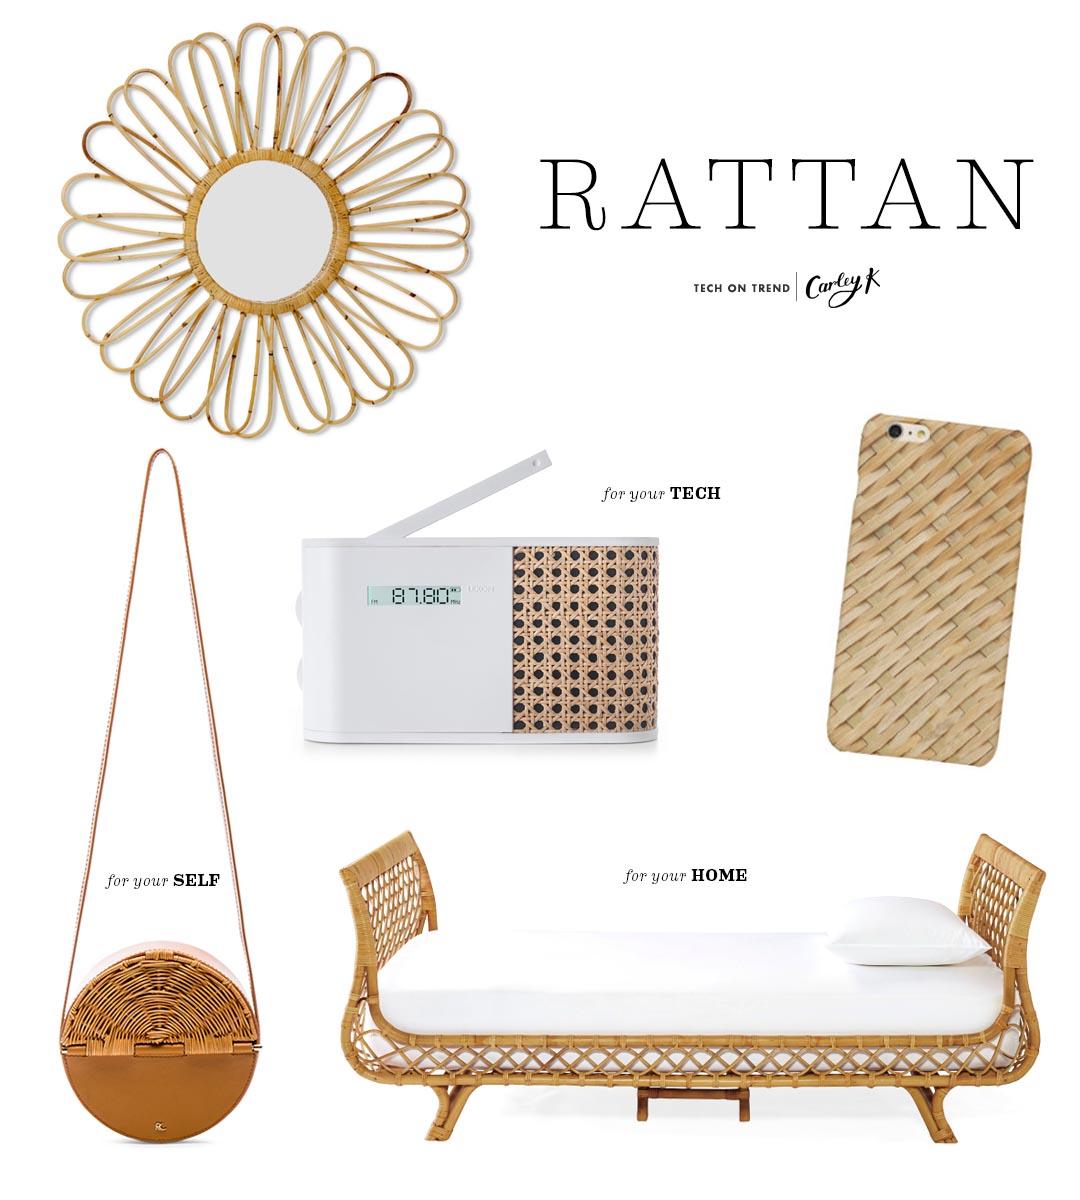 Tech on trend: Rattan